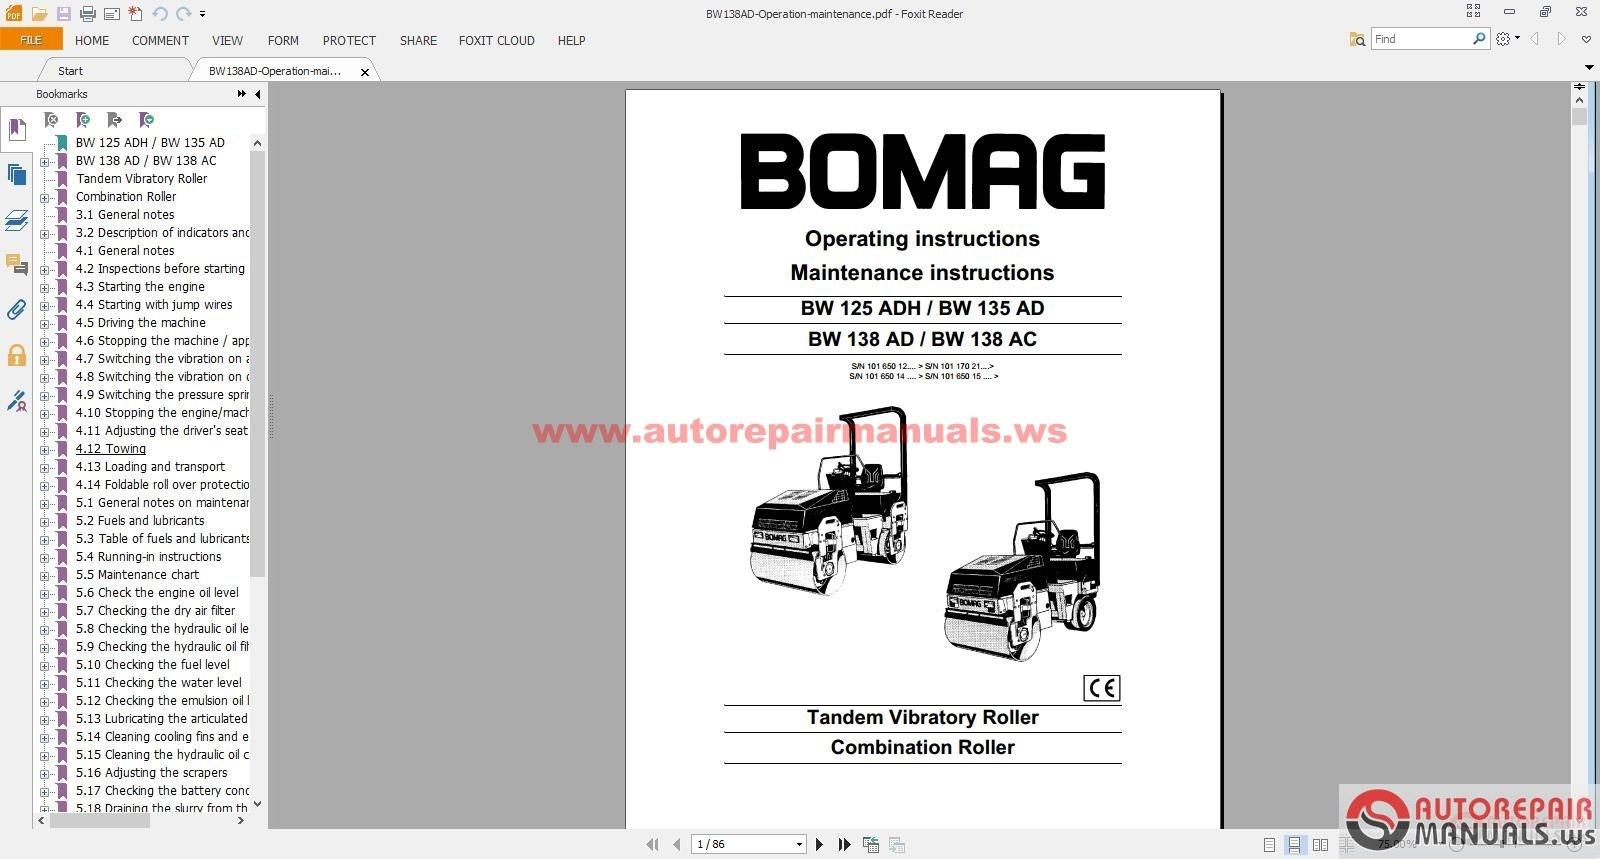 bomag bw100ad 3 wiring diagram 2005 mazda 3 wiring diagram free auto repair manual : bomag full set service manuals ...